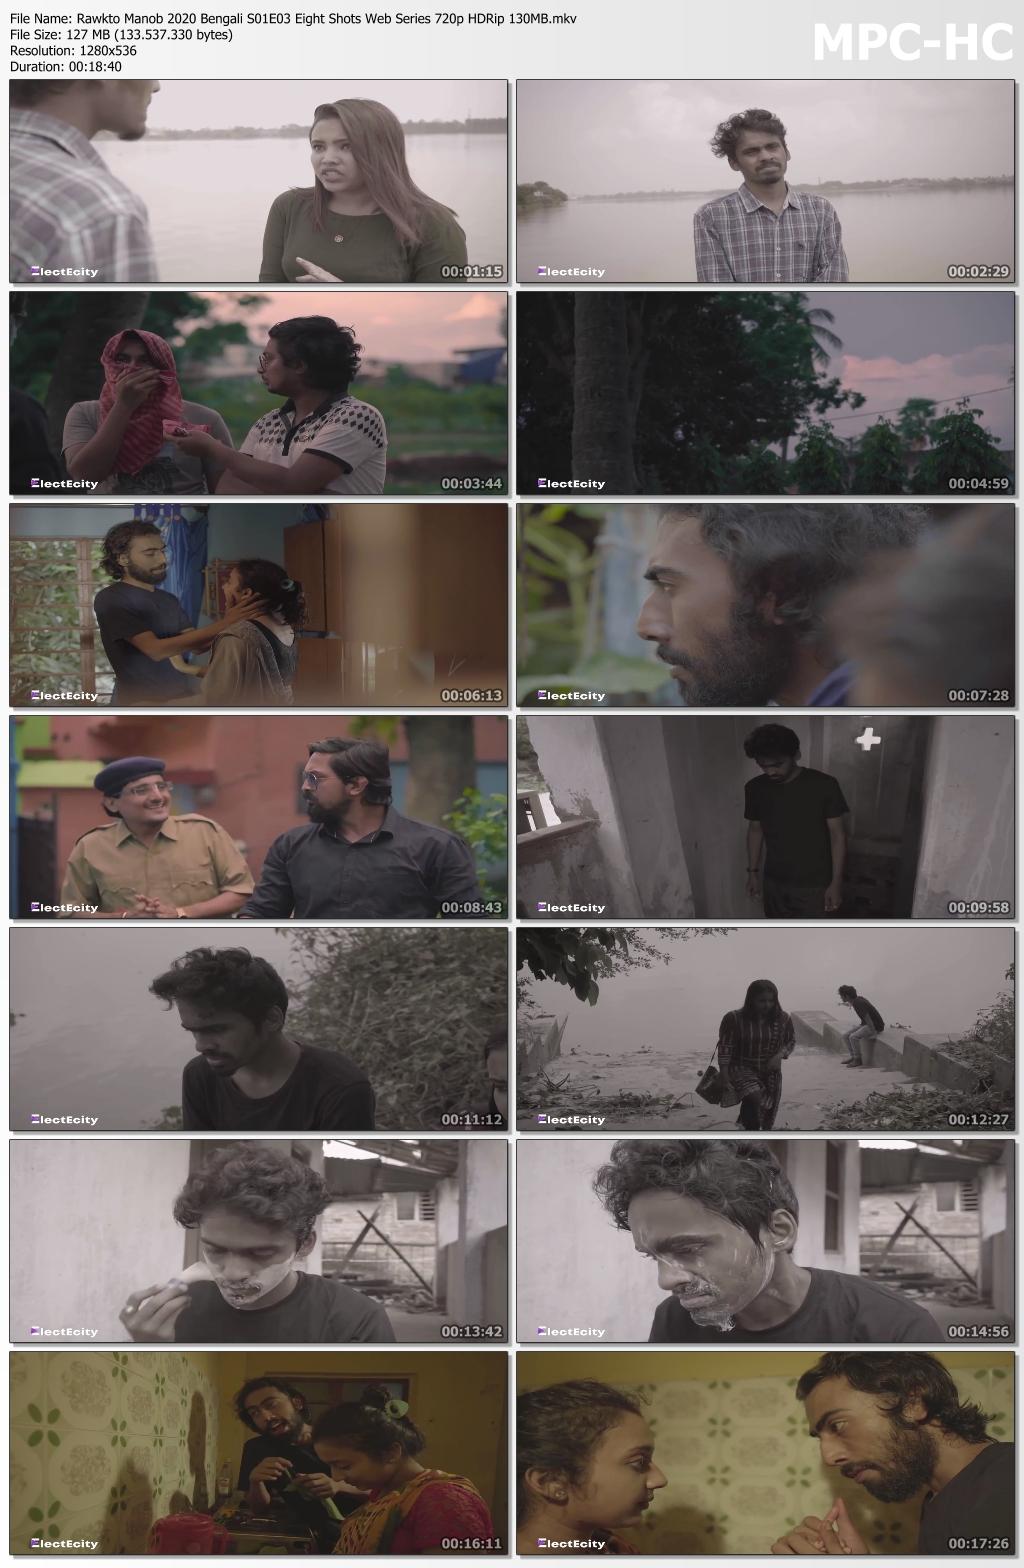 Rawkto-Manob-2020-Bengali-S01-E03-Eight-Shots-Web-Series-720p-HDRip-130-MB-mkv-thumbs